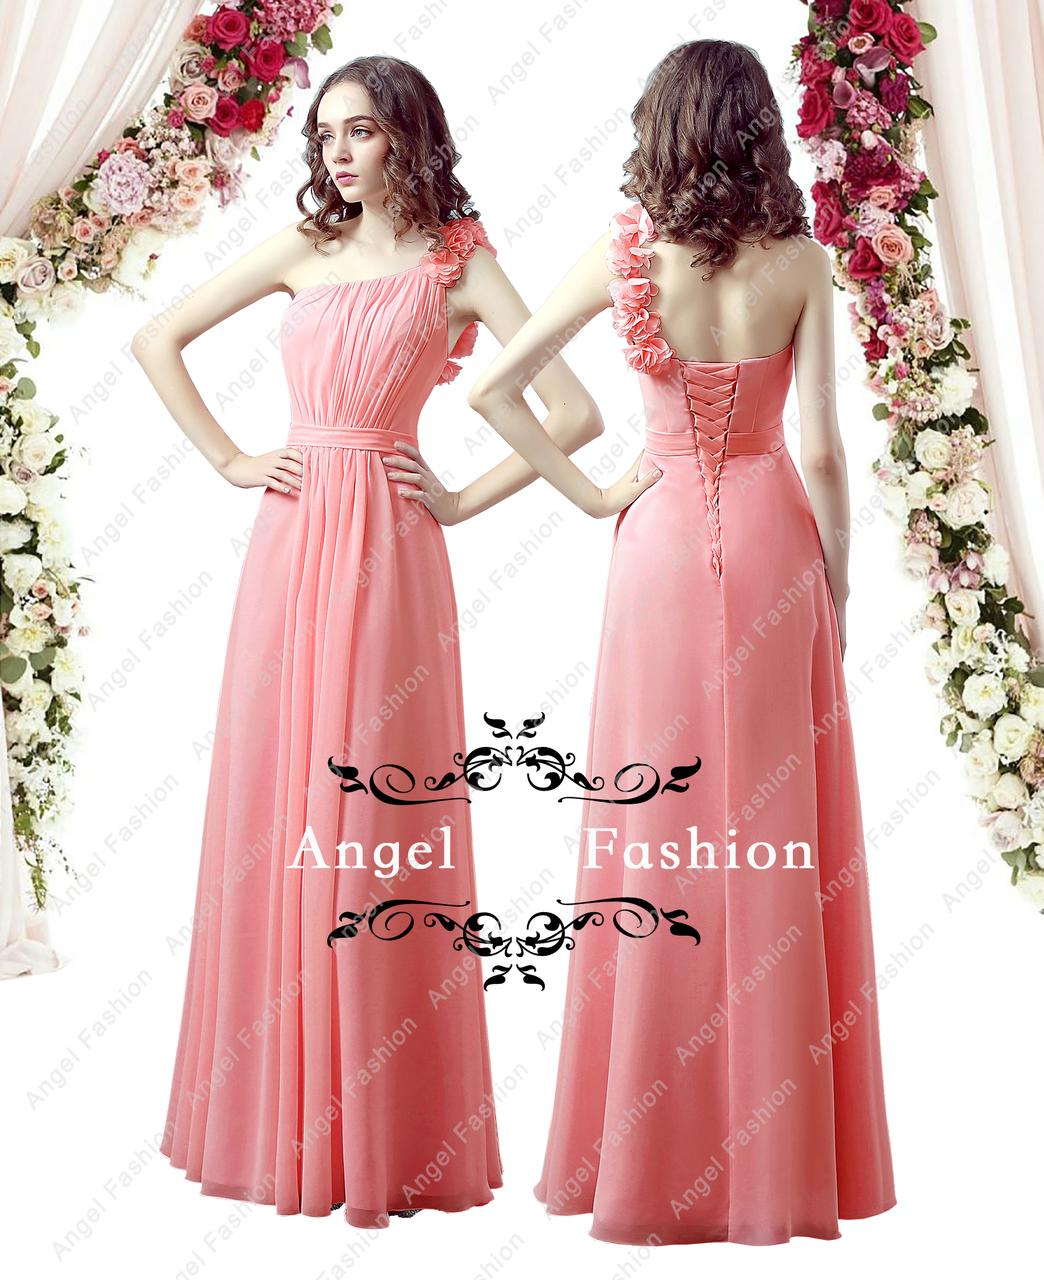 A-Line/Princess Full-Length Chiffon Evening Prom Bridesmaid Dress